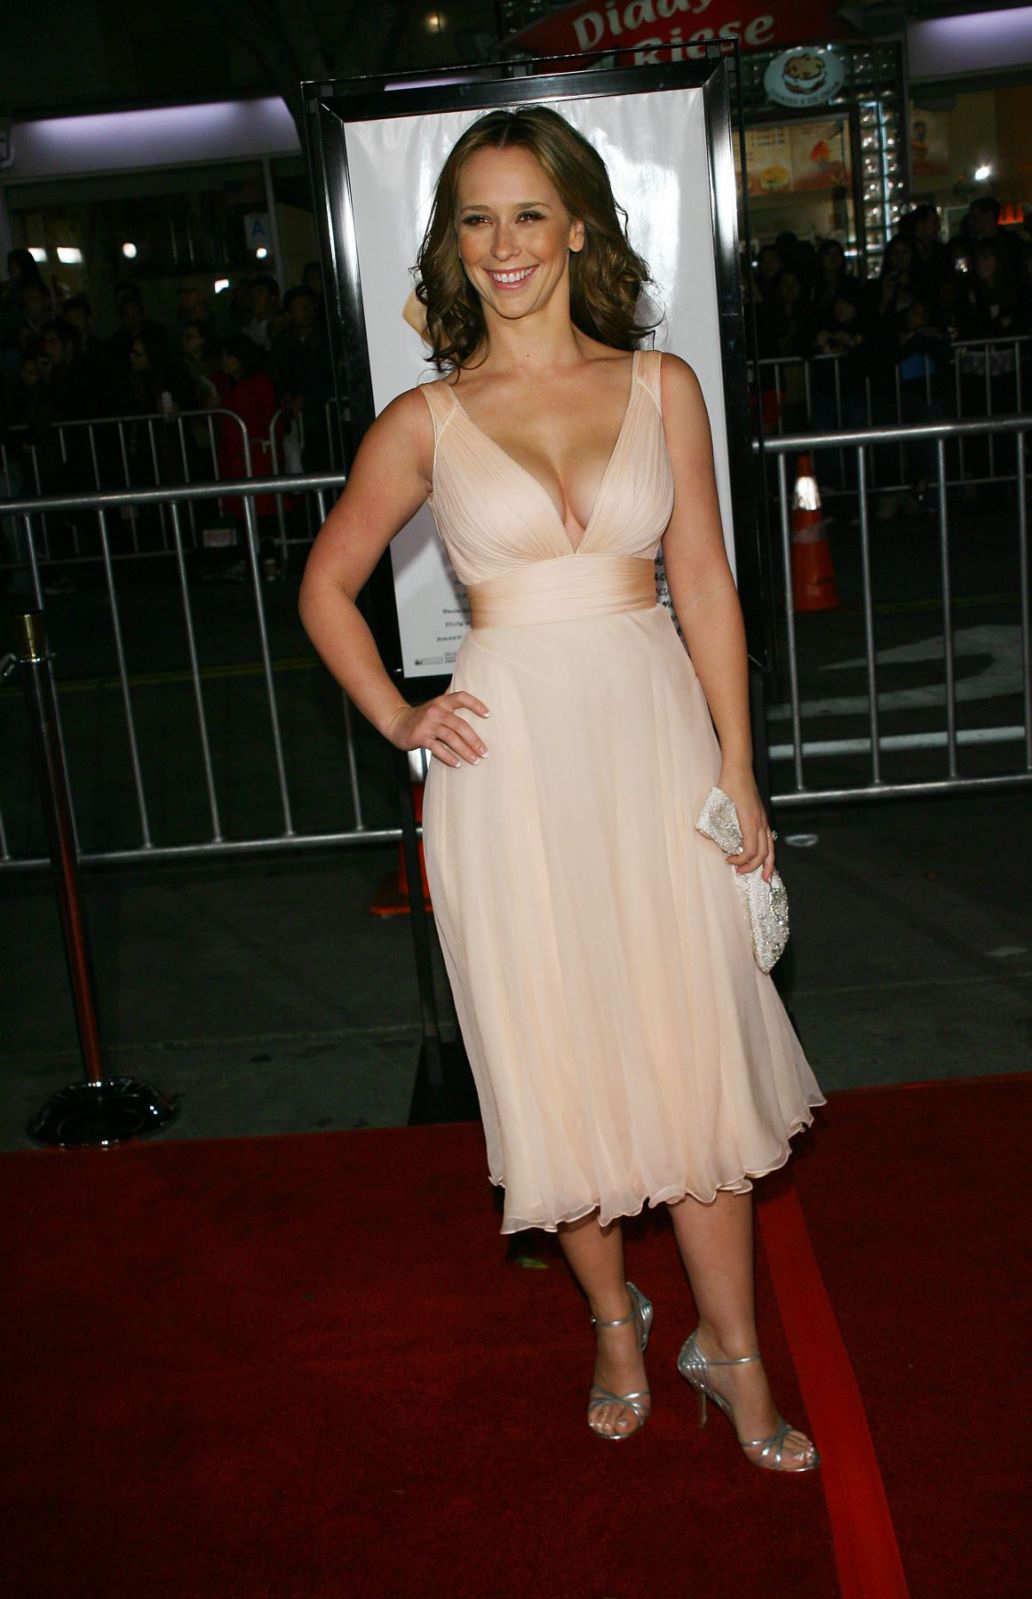 http://1.bp.blogspot.com/_u8H1VuXpFmY/TFEoYv6bQBI/AAAAAAAABJE/H-S5liSnSY4/s1600/Jennifer+Love+Hewitt+%285%29.jpg